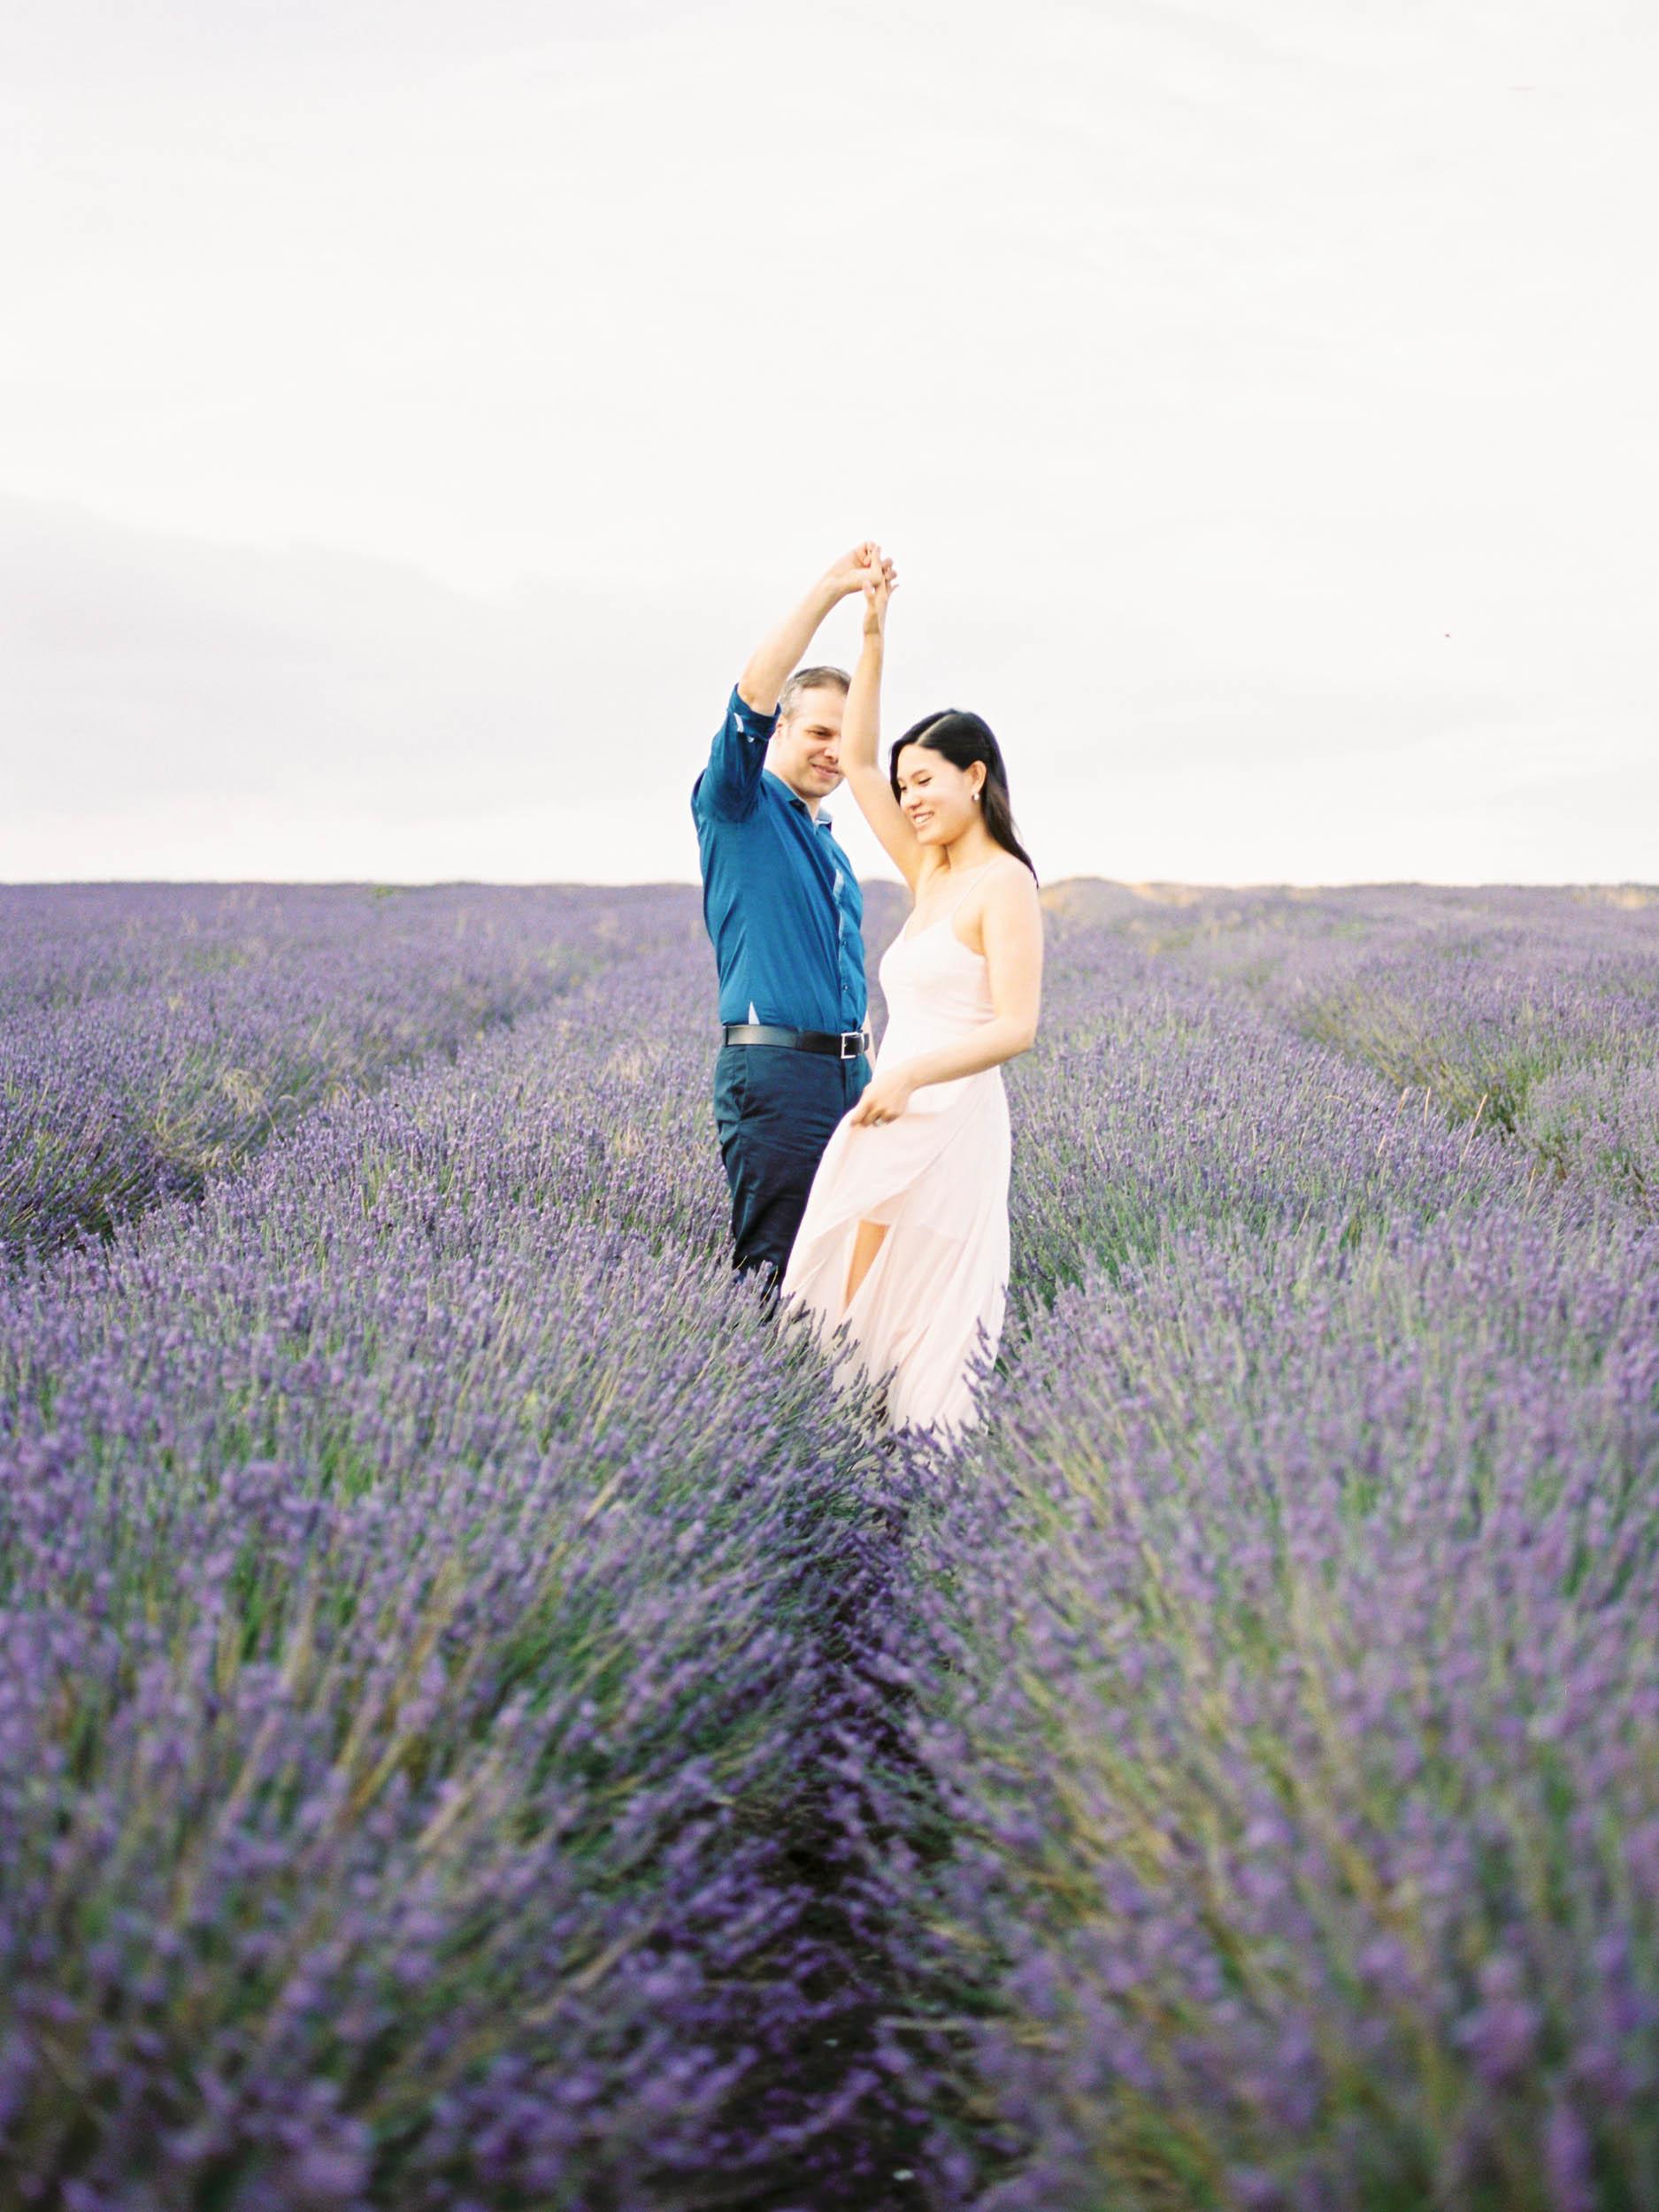 Amy O'Boyle Photography- Destination & UK Fine Art Film Wedding Photographer- Hitchin Lavender Engagement Shoot-31.jpg